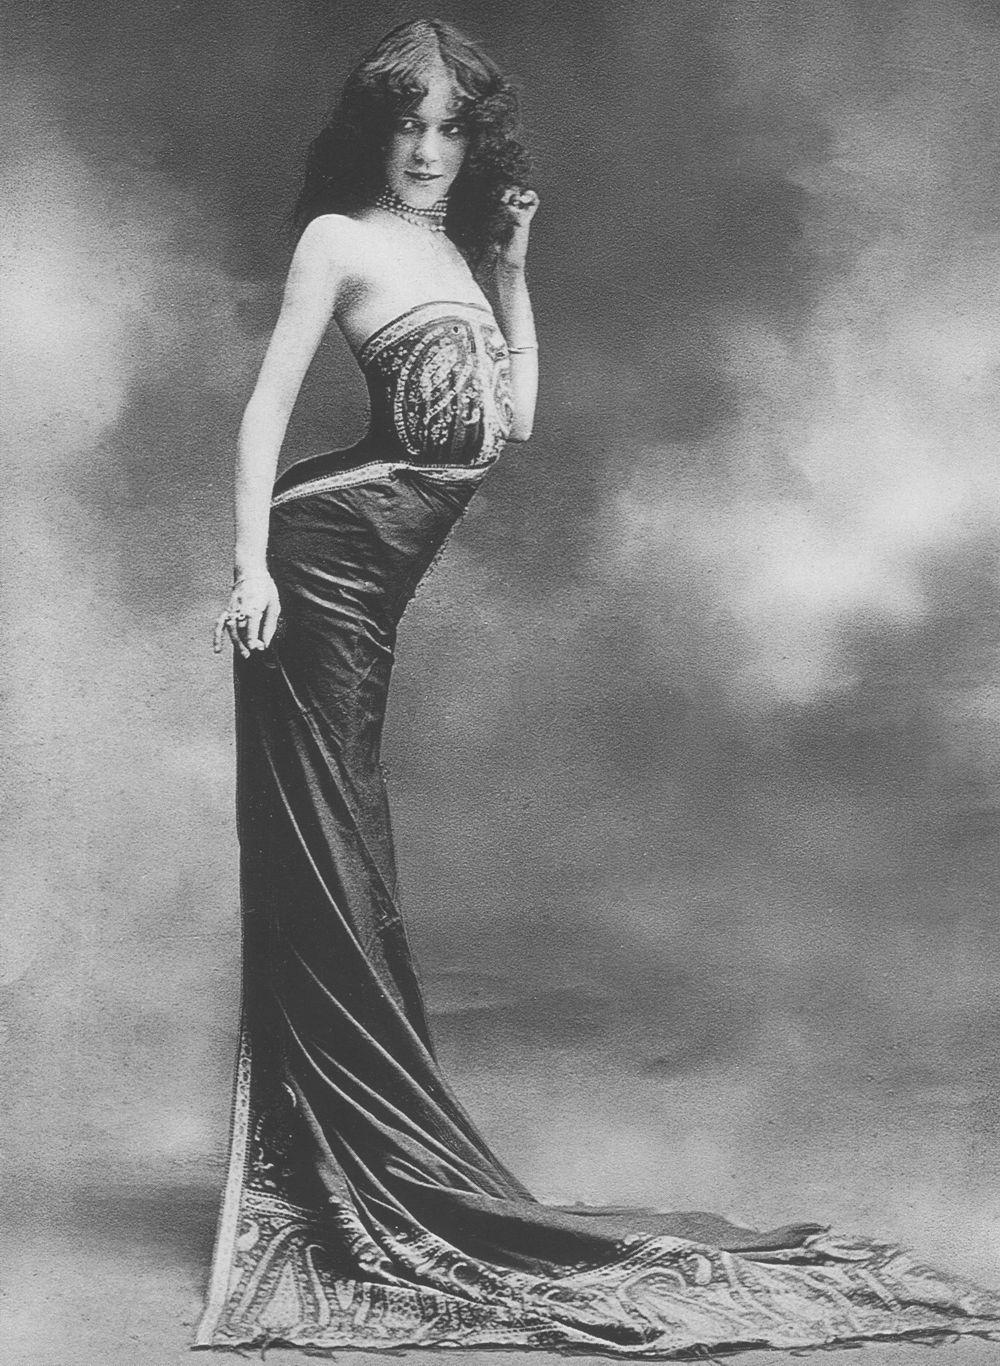 DARK VENUS - Maud Allan & the Myth of the Femme Fatale